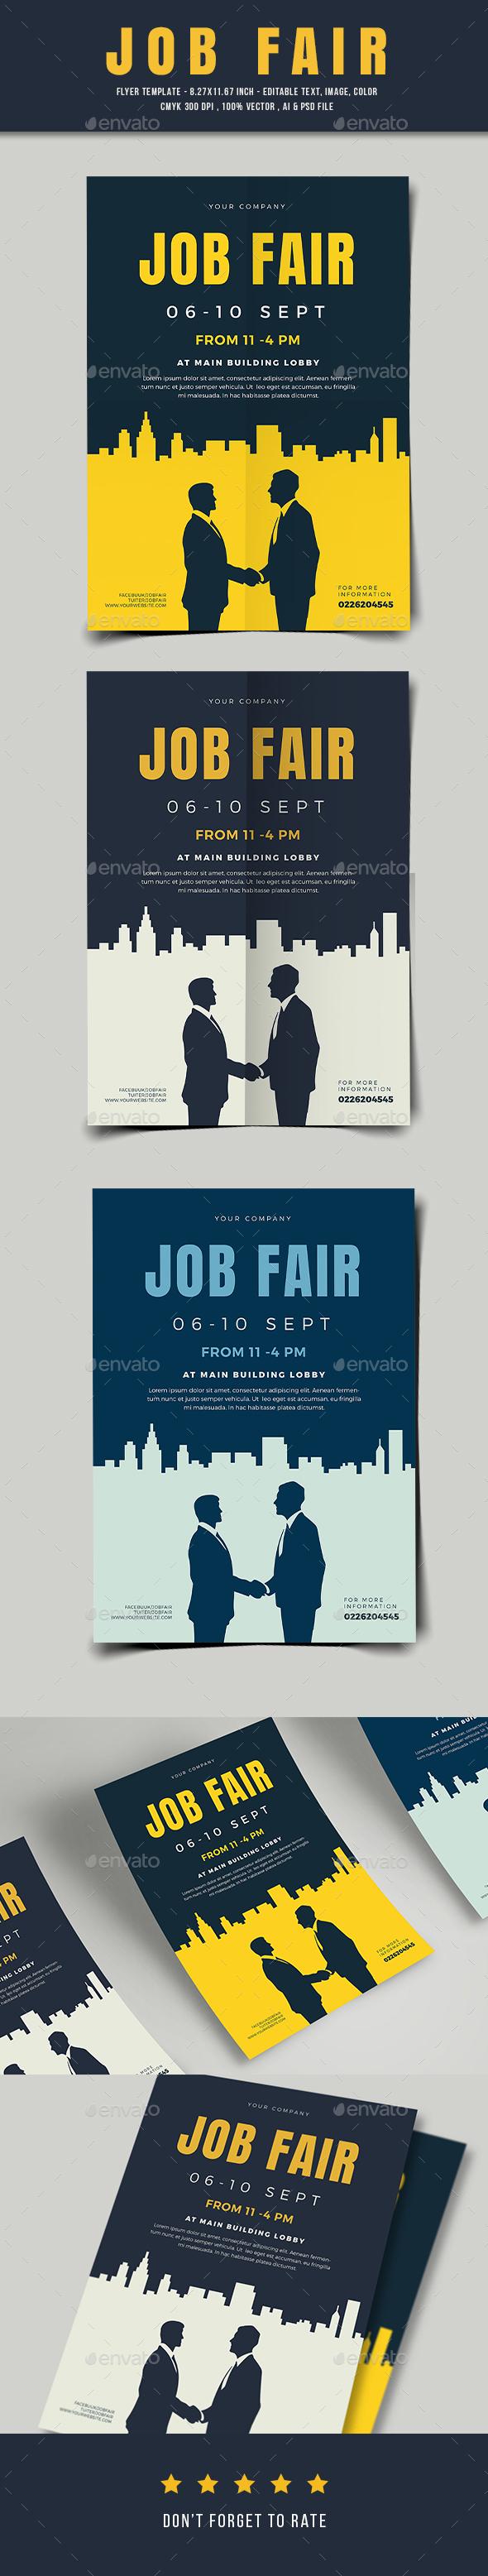 GraphicRiver Job Fair Flyer 03 20678194